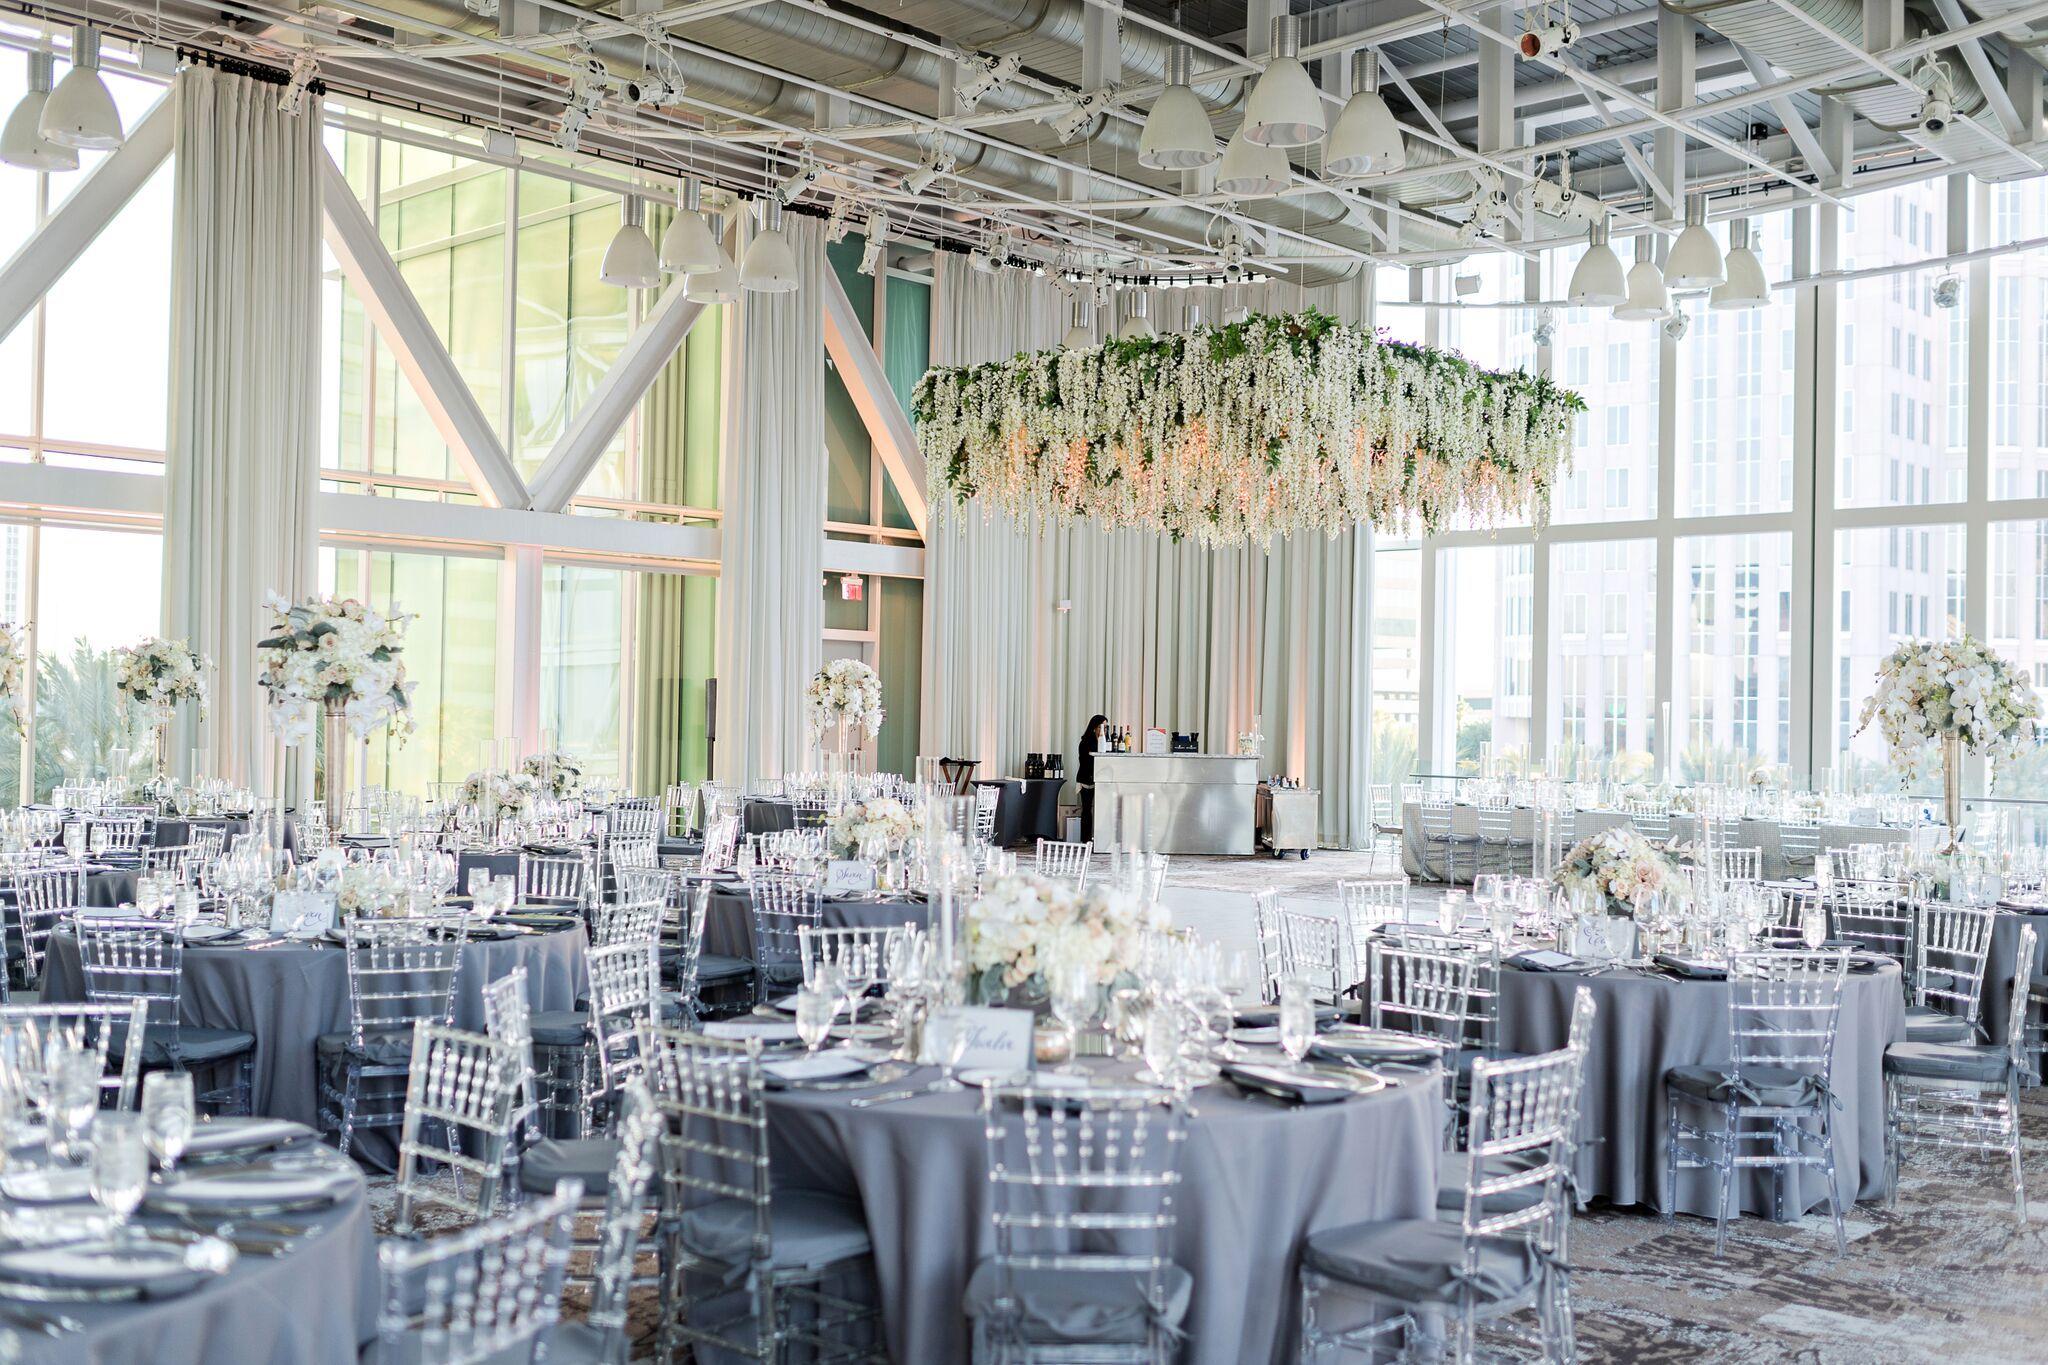 Clear Chiavari Chairs Orlando Wedding And Party Rentals Low Cost Wedding Wedding Rentals Chiavari Chairs